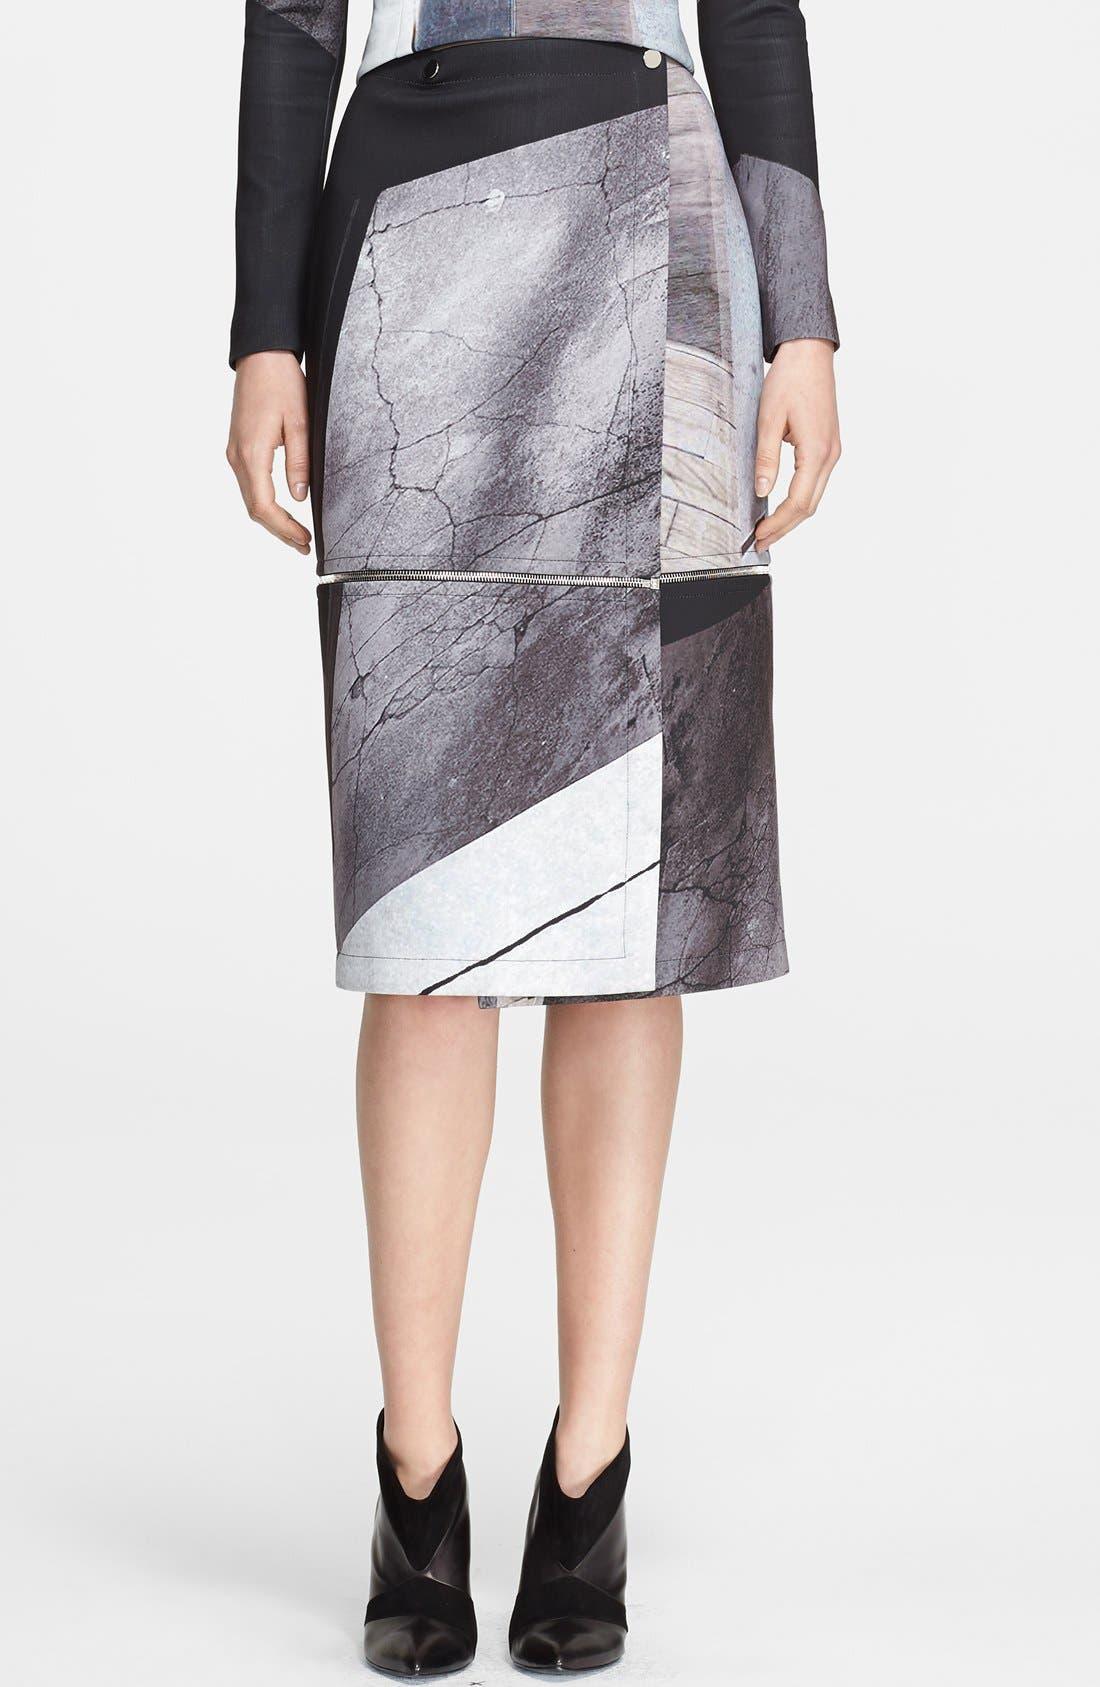 Main Image - Yigal Azrouël Print Adjustable Length Skirt